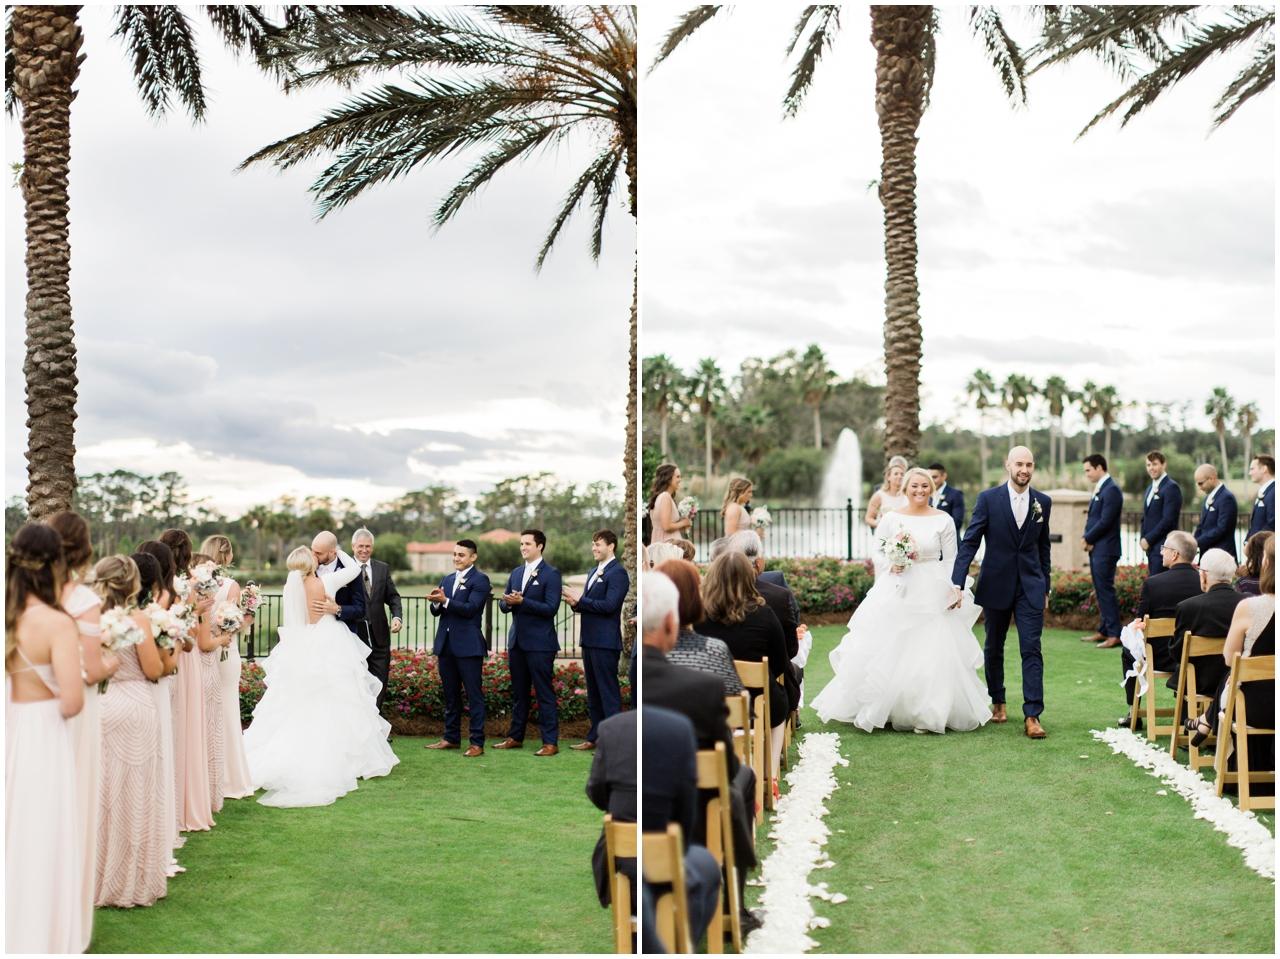 Jacksonville-Wedding-photographers-brooke-images-TPC-Sawgrass-Wedding-Mary-Kevin-blog_0028.jpg